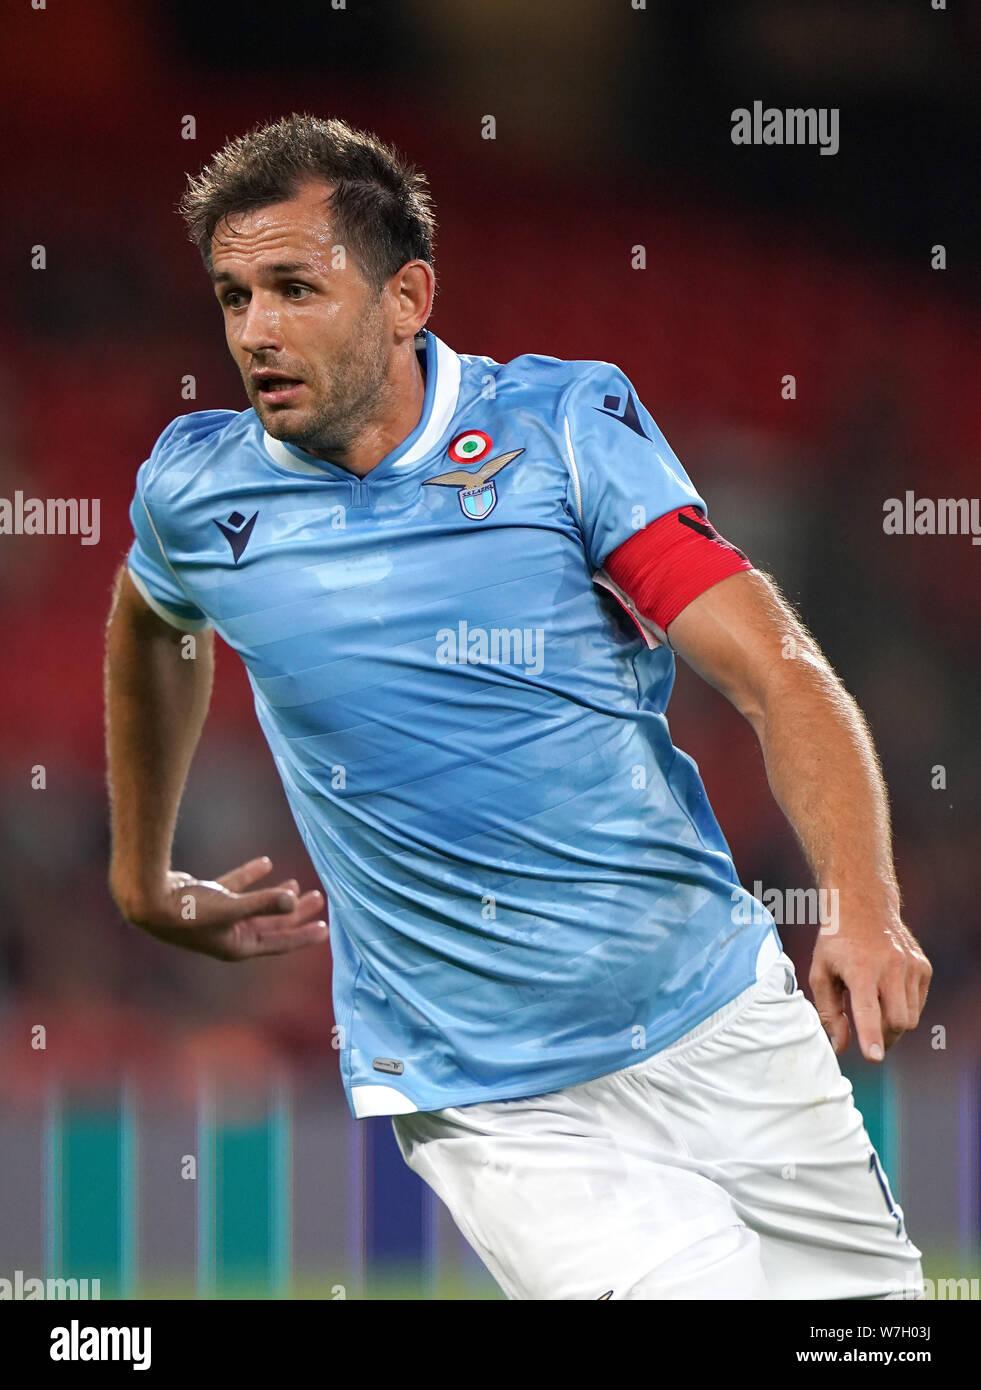 Lazio's Senad Lulic Stock Photo - Alamy